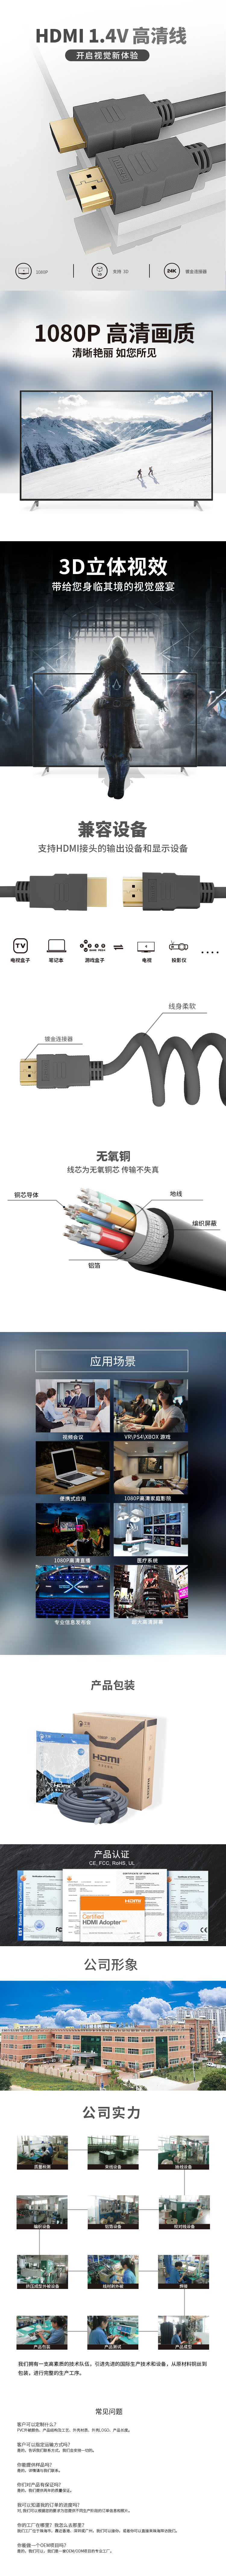 PVC HDMI 1.4中文.jpg